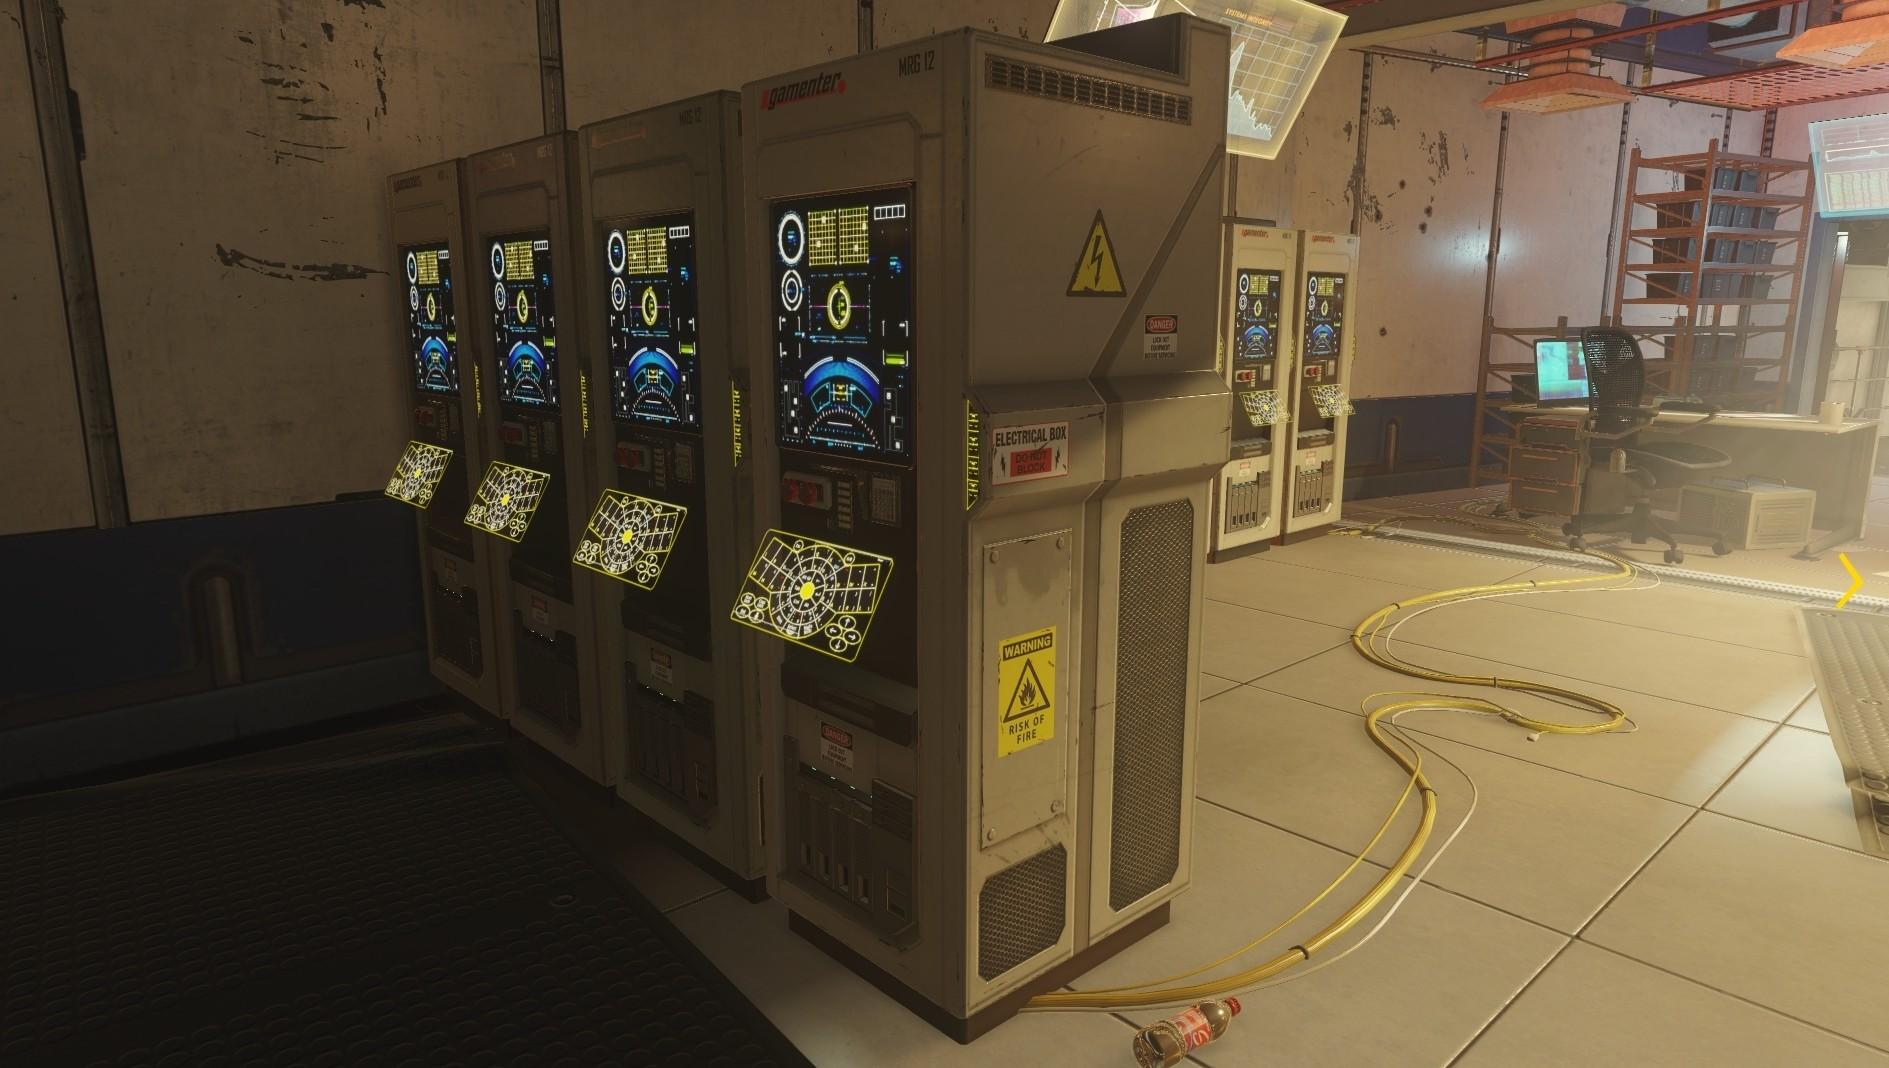 Brx boyles 07 terminal